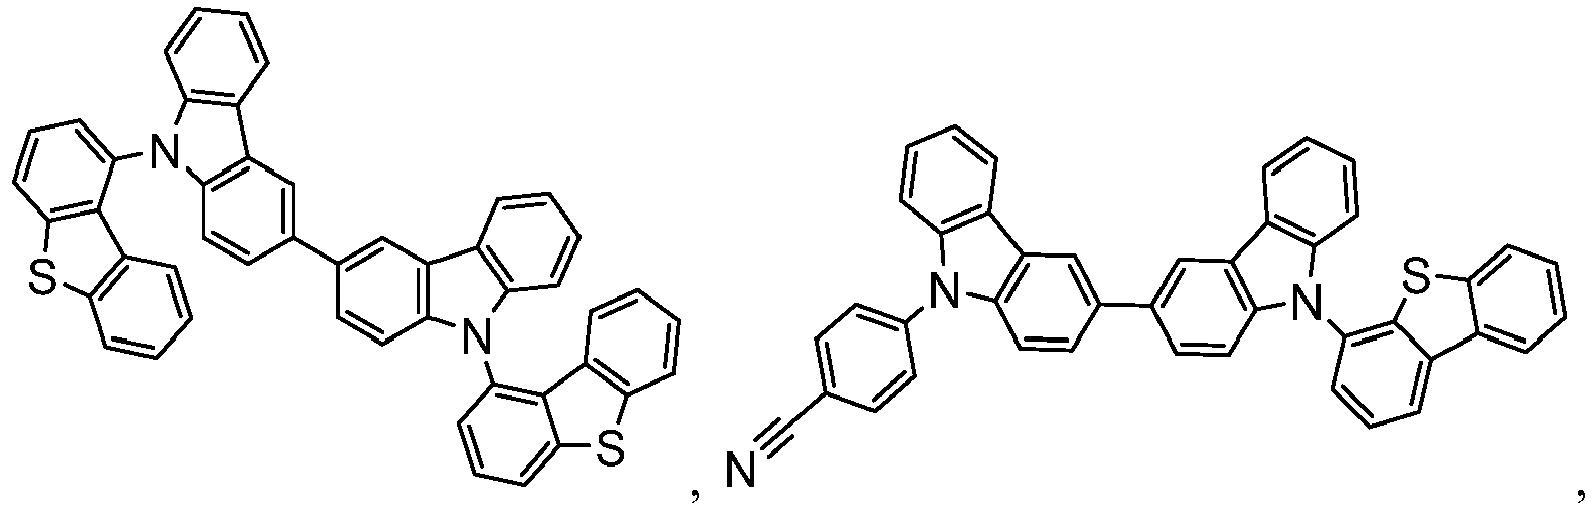 Figure imgb0895